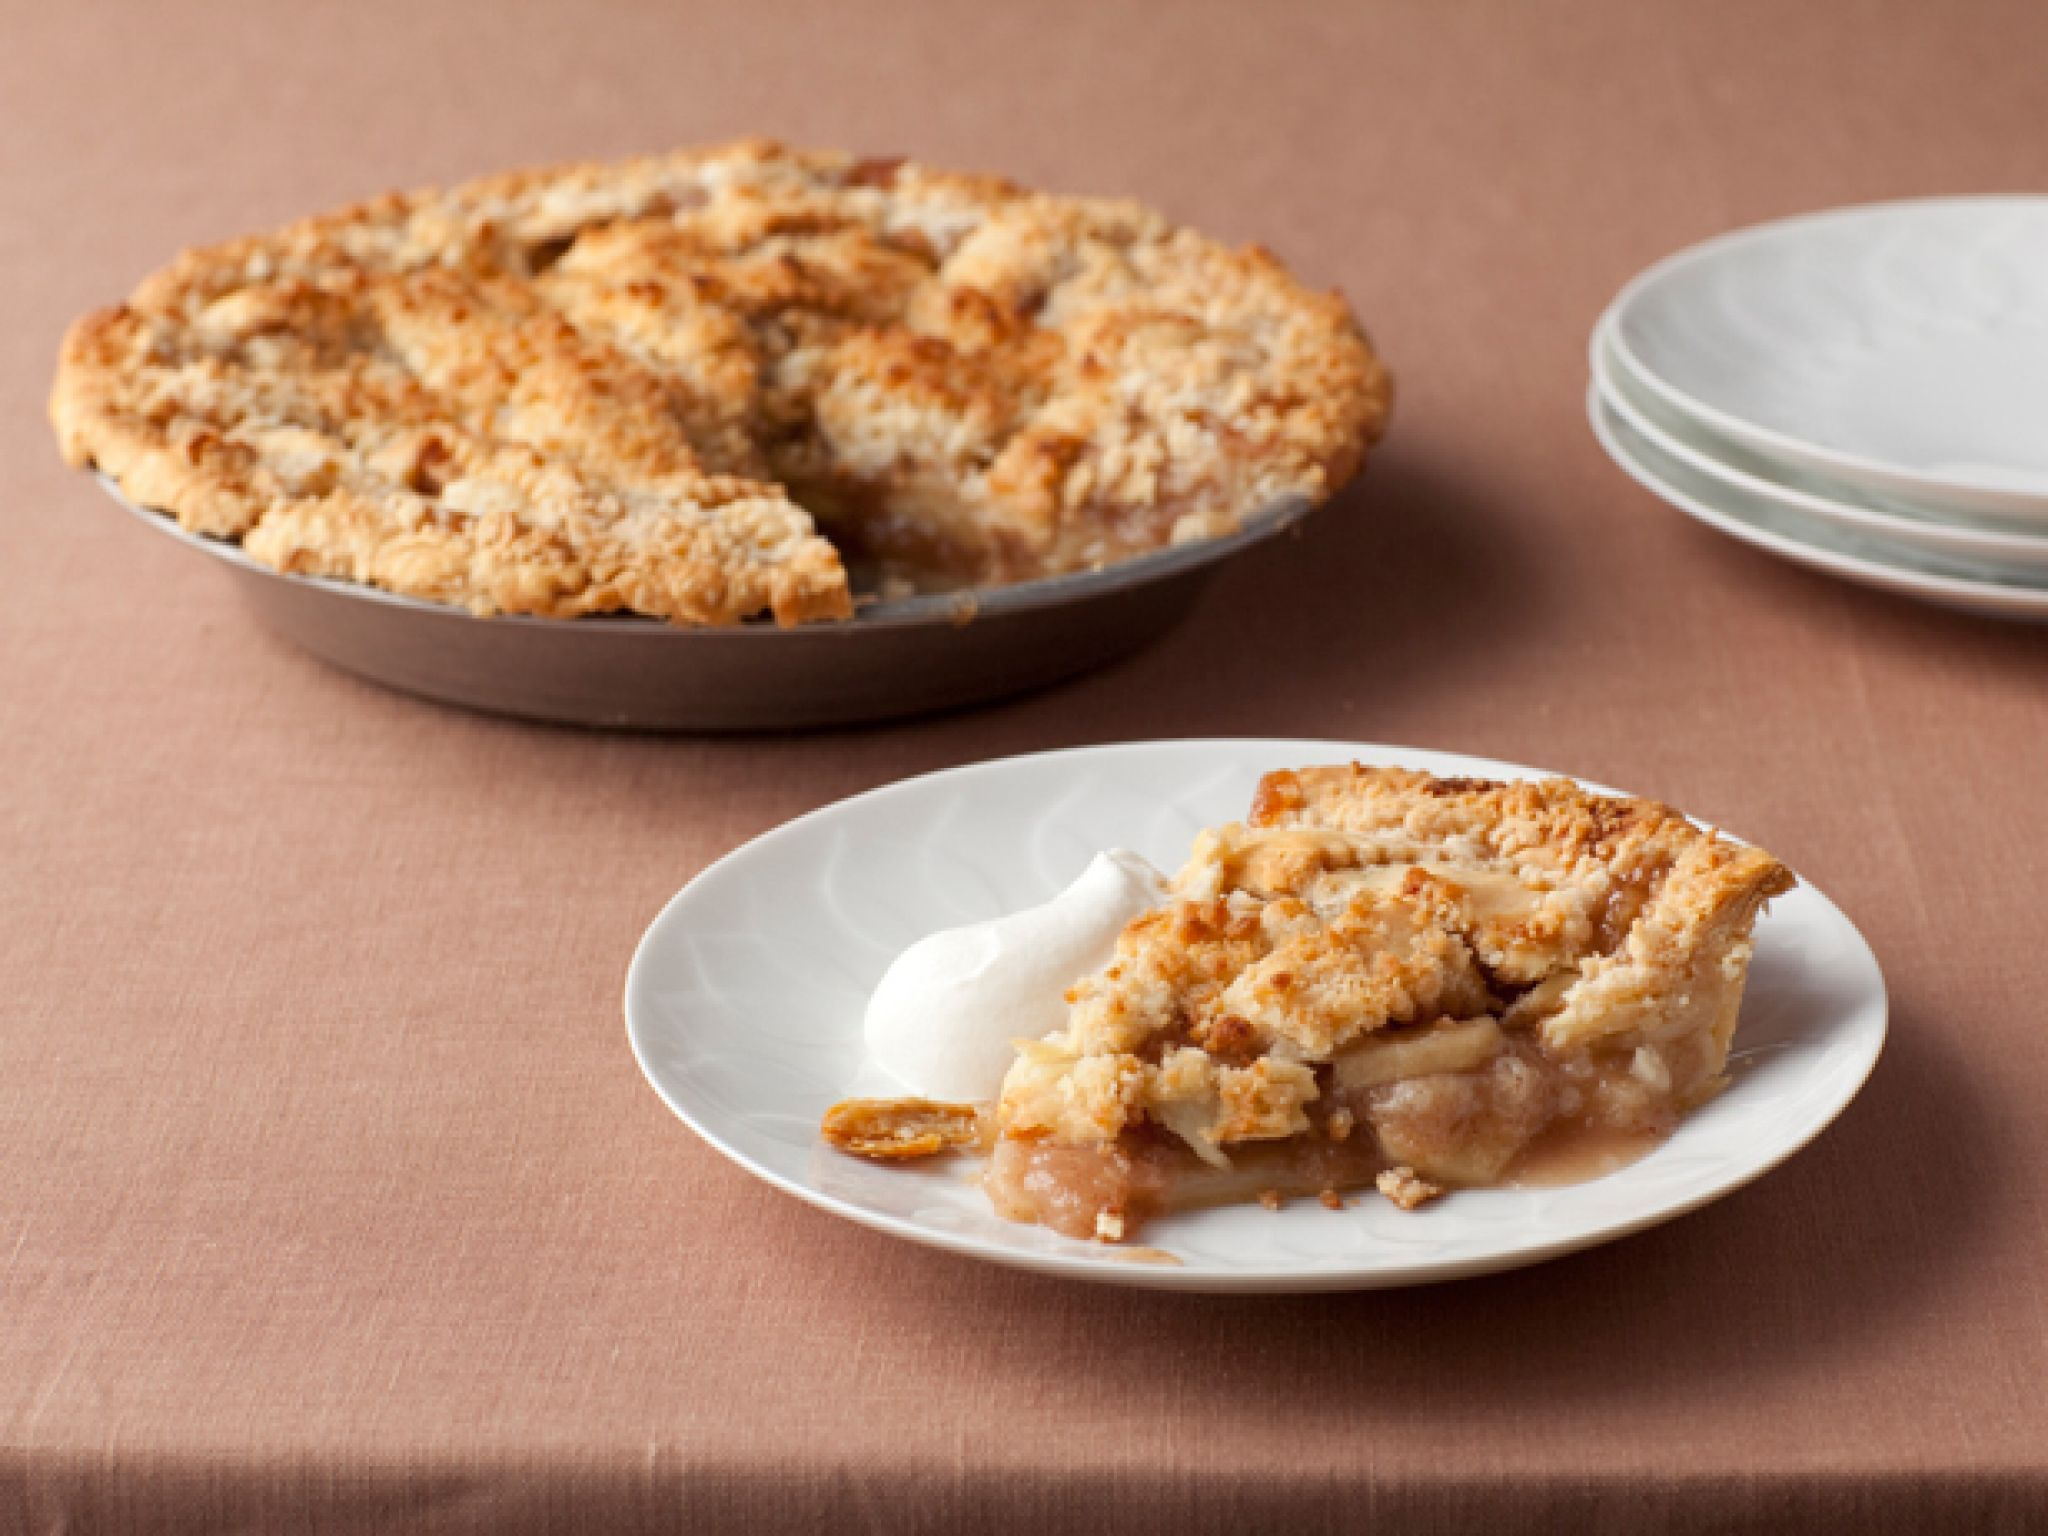 Crunch top apple pie recipe apple pie recipes paula deen and crunch top apple pie forumfinder Choice Image